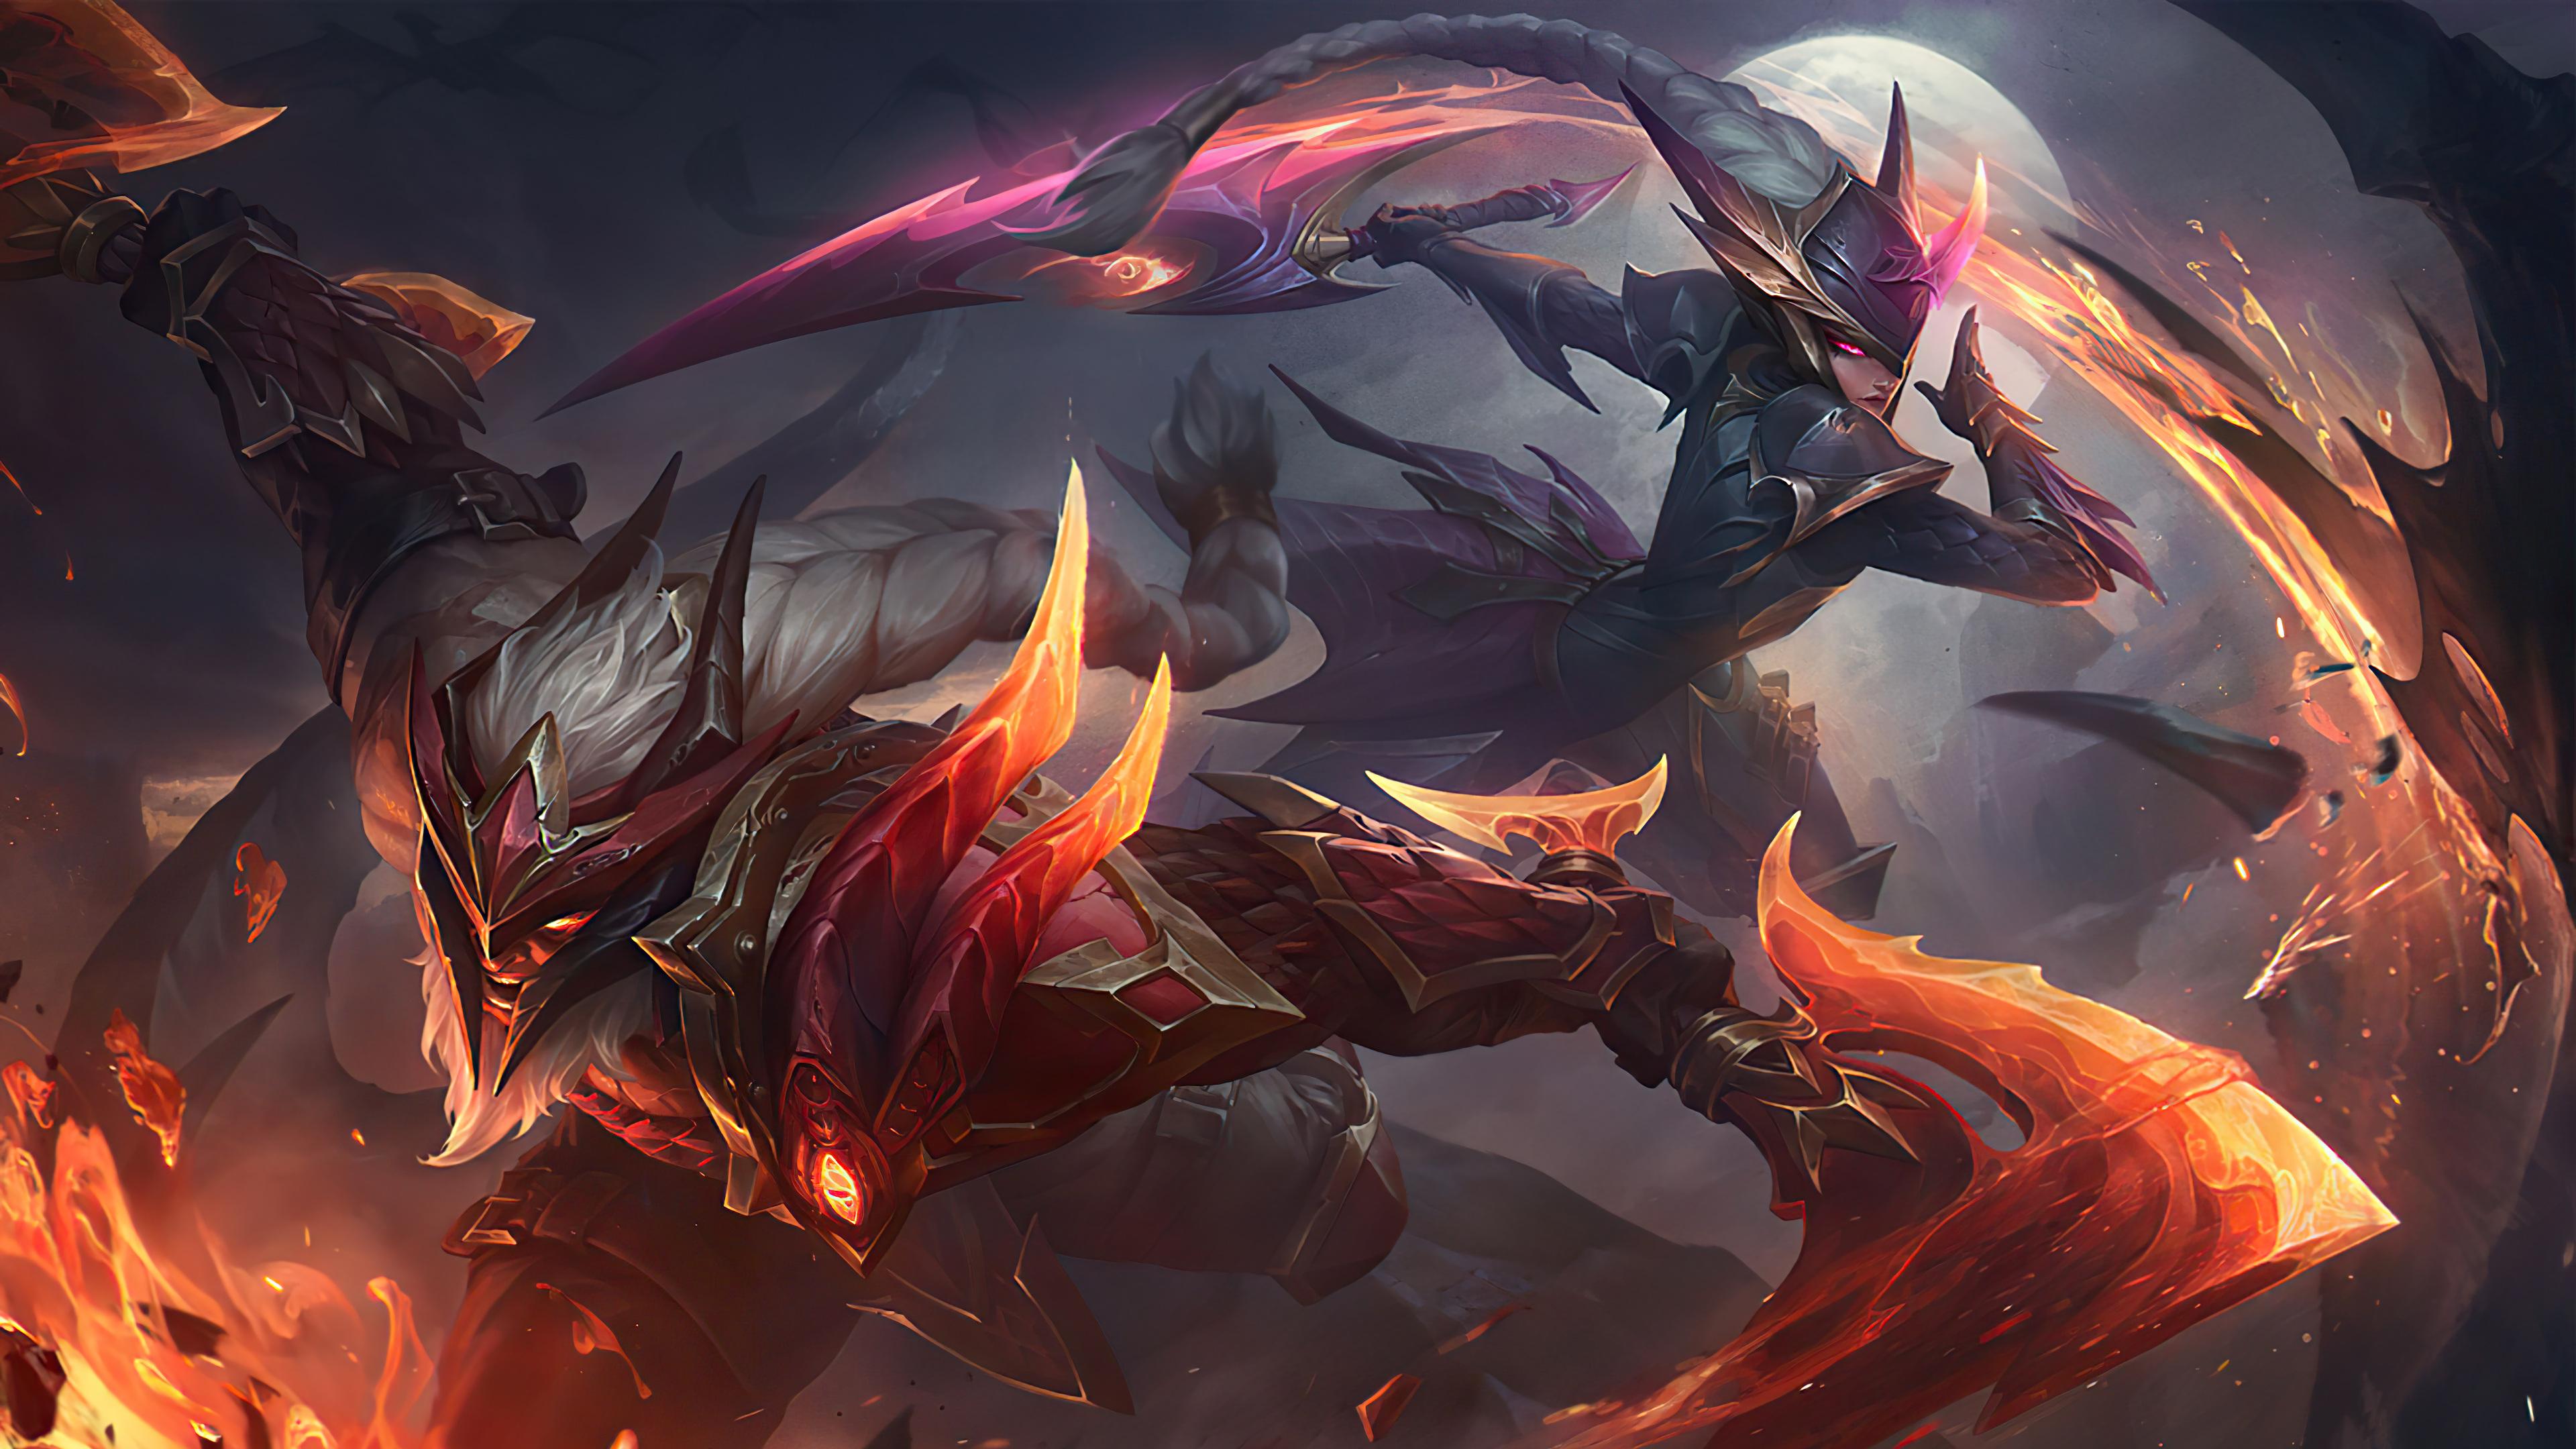 General 3840x2160 Olaf fire dragon League of Legends Riot Games Diana (League of Legends) GZG Olaf (League of Legends)